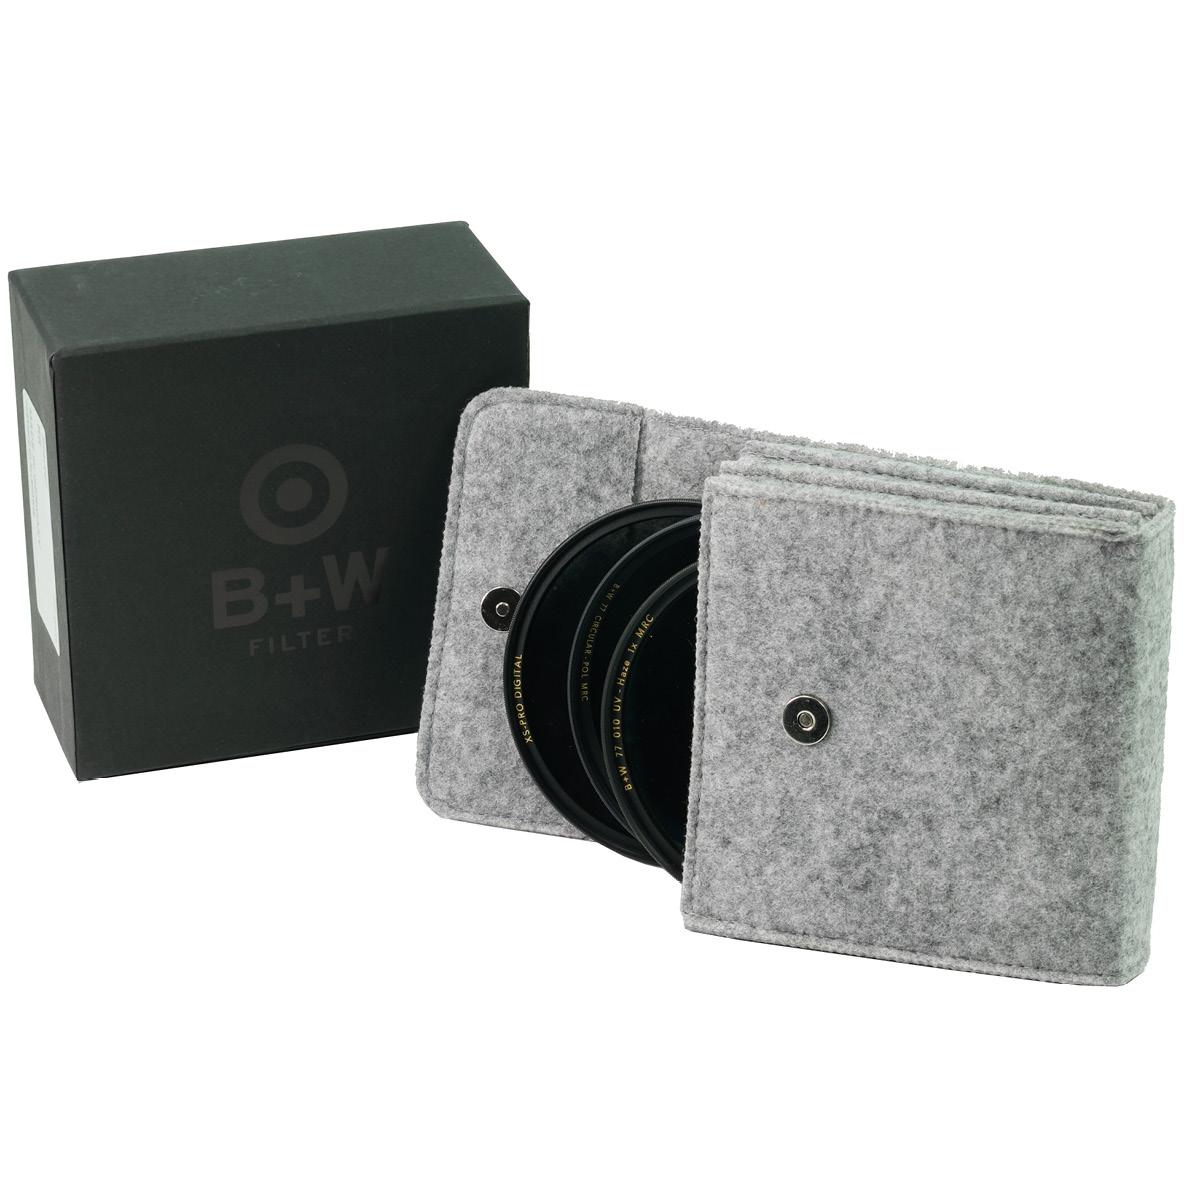 B+W Creative Starter Kit 39 mm